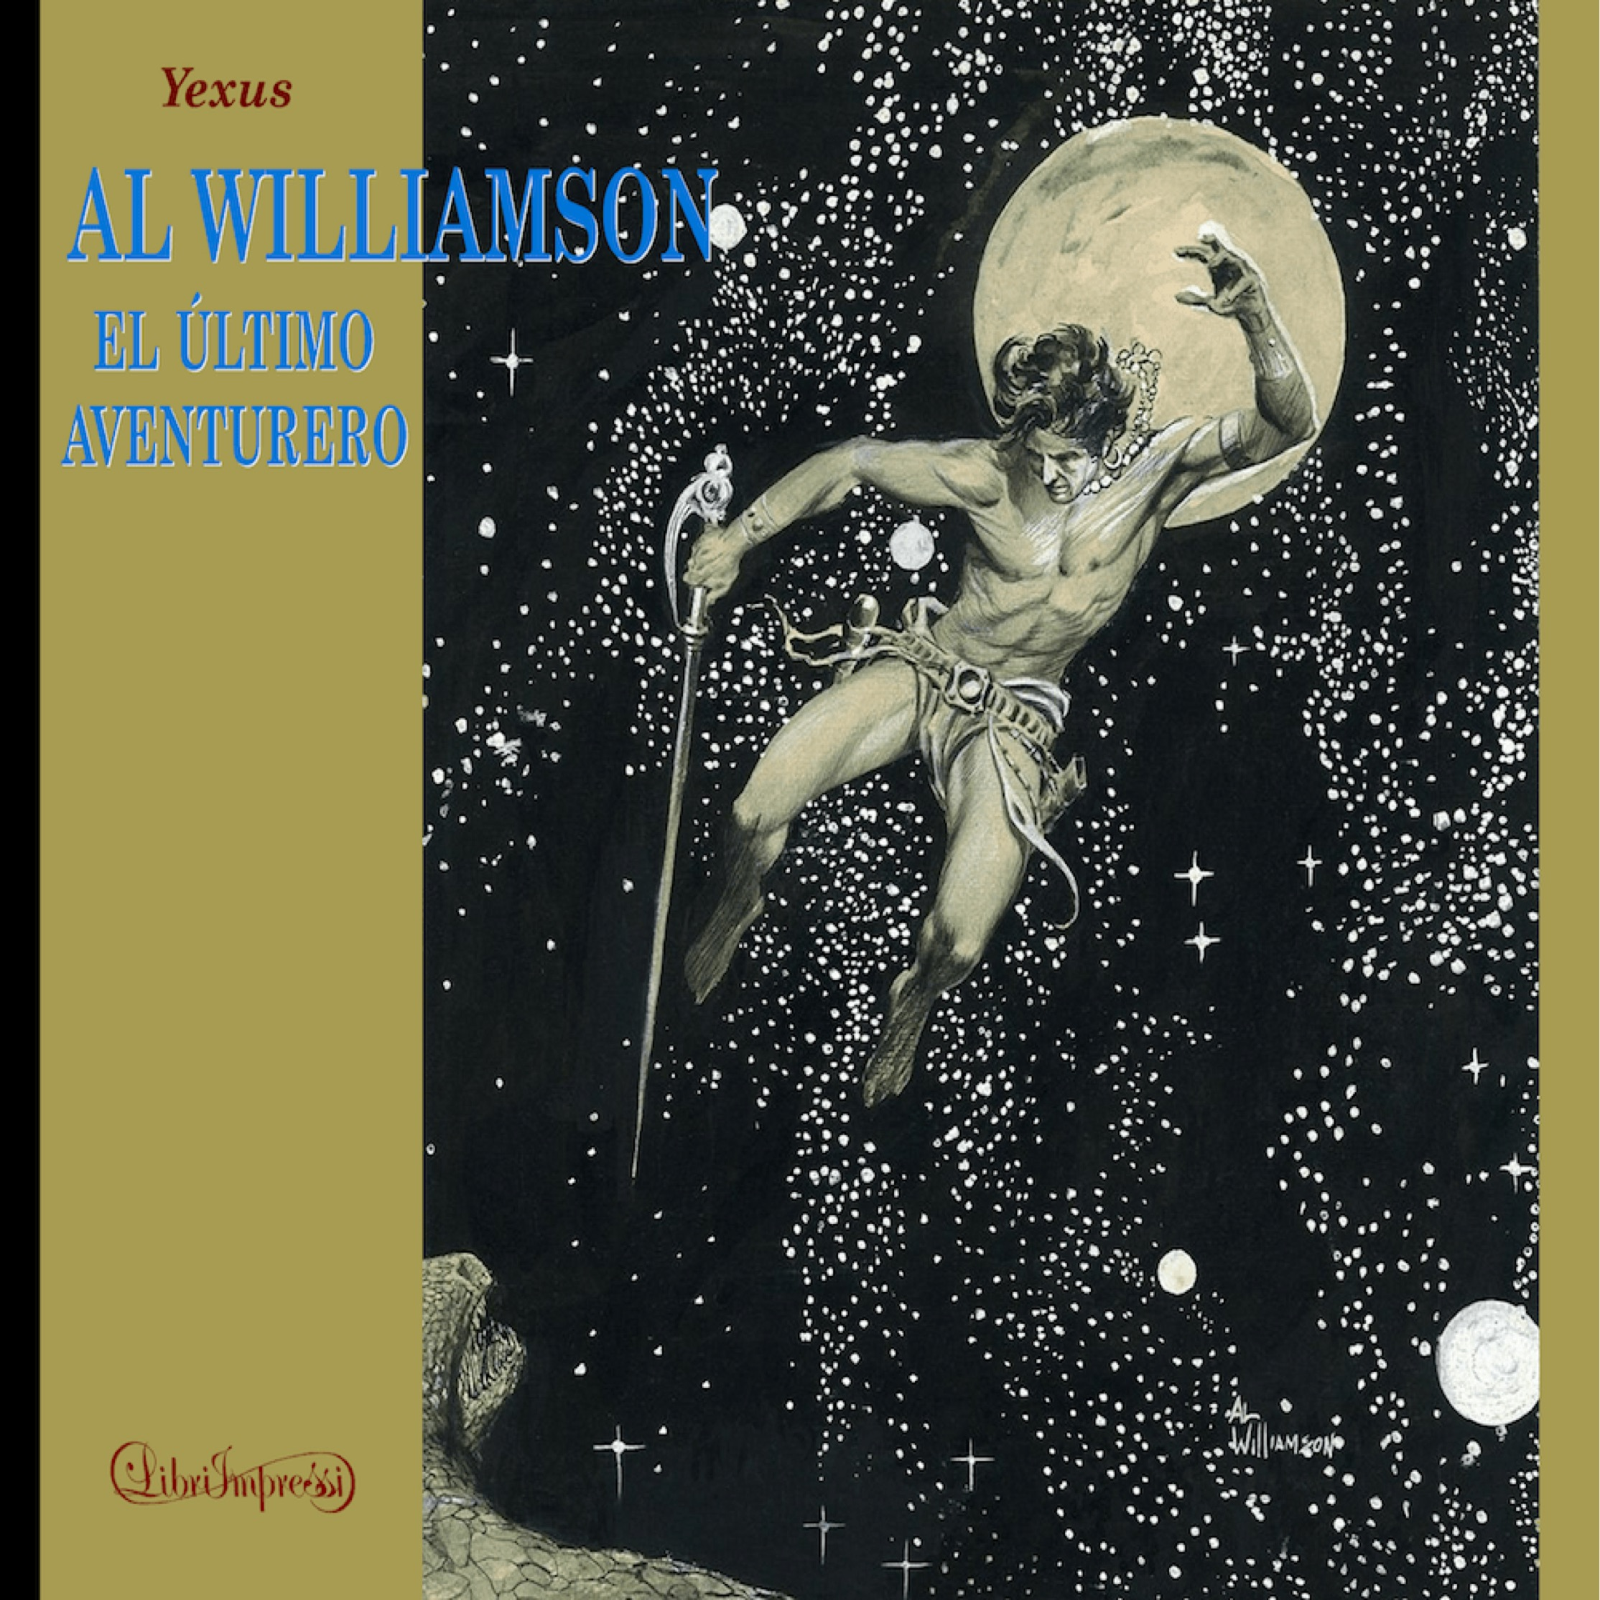 AL WILLIAMSON, EL ULTIMO AVENTURERO